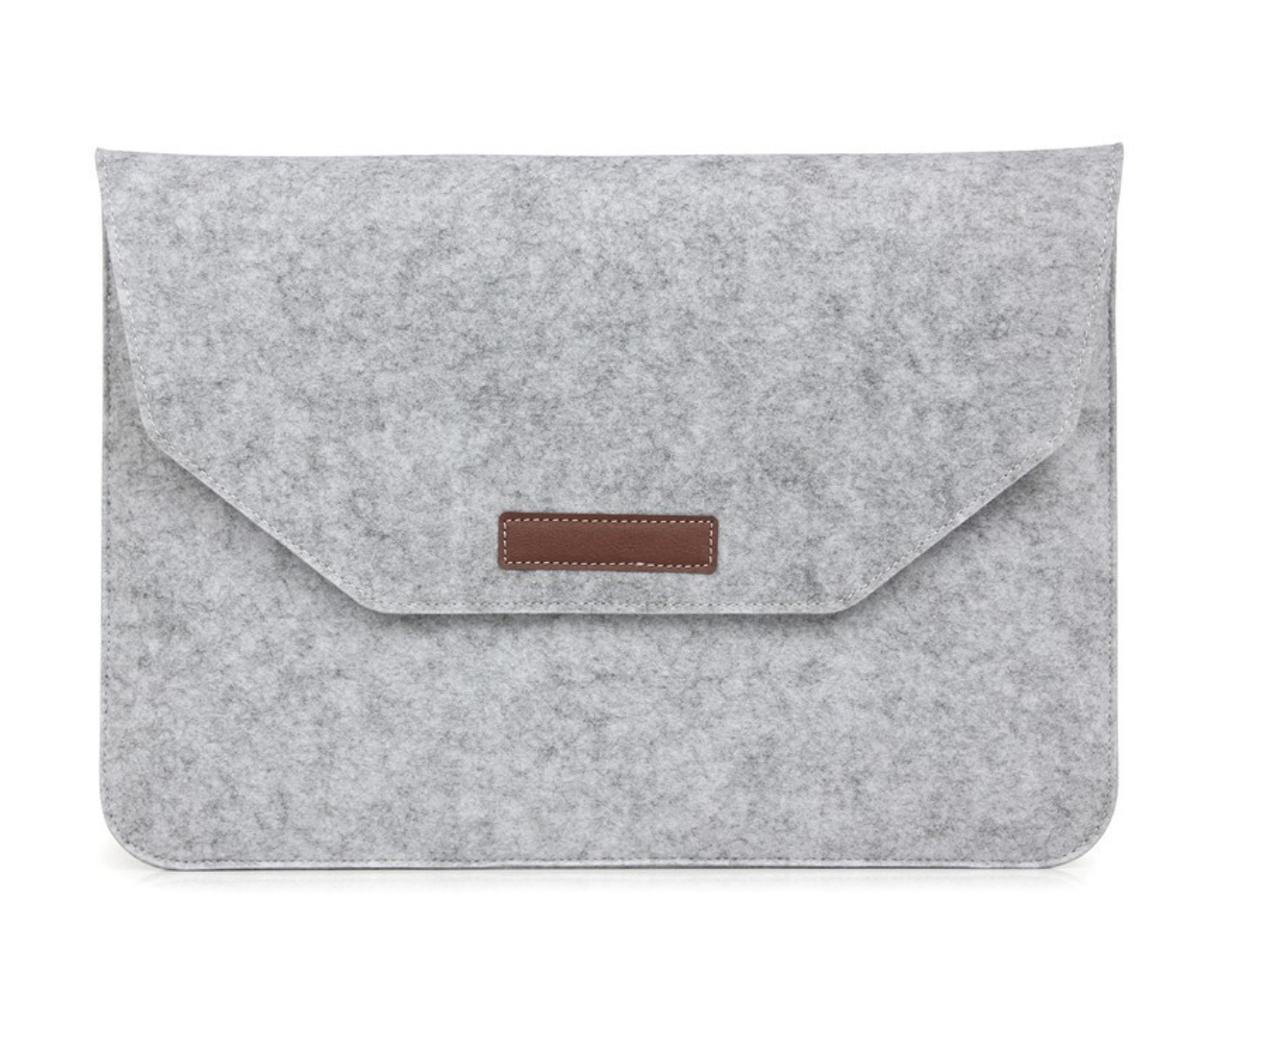 "Чохол-конверт з фетру для Macbook Air/Pro 13,3"" - сірий"